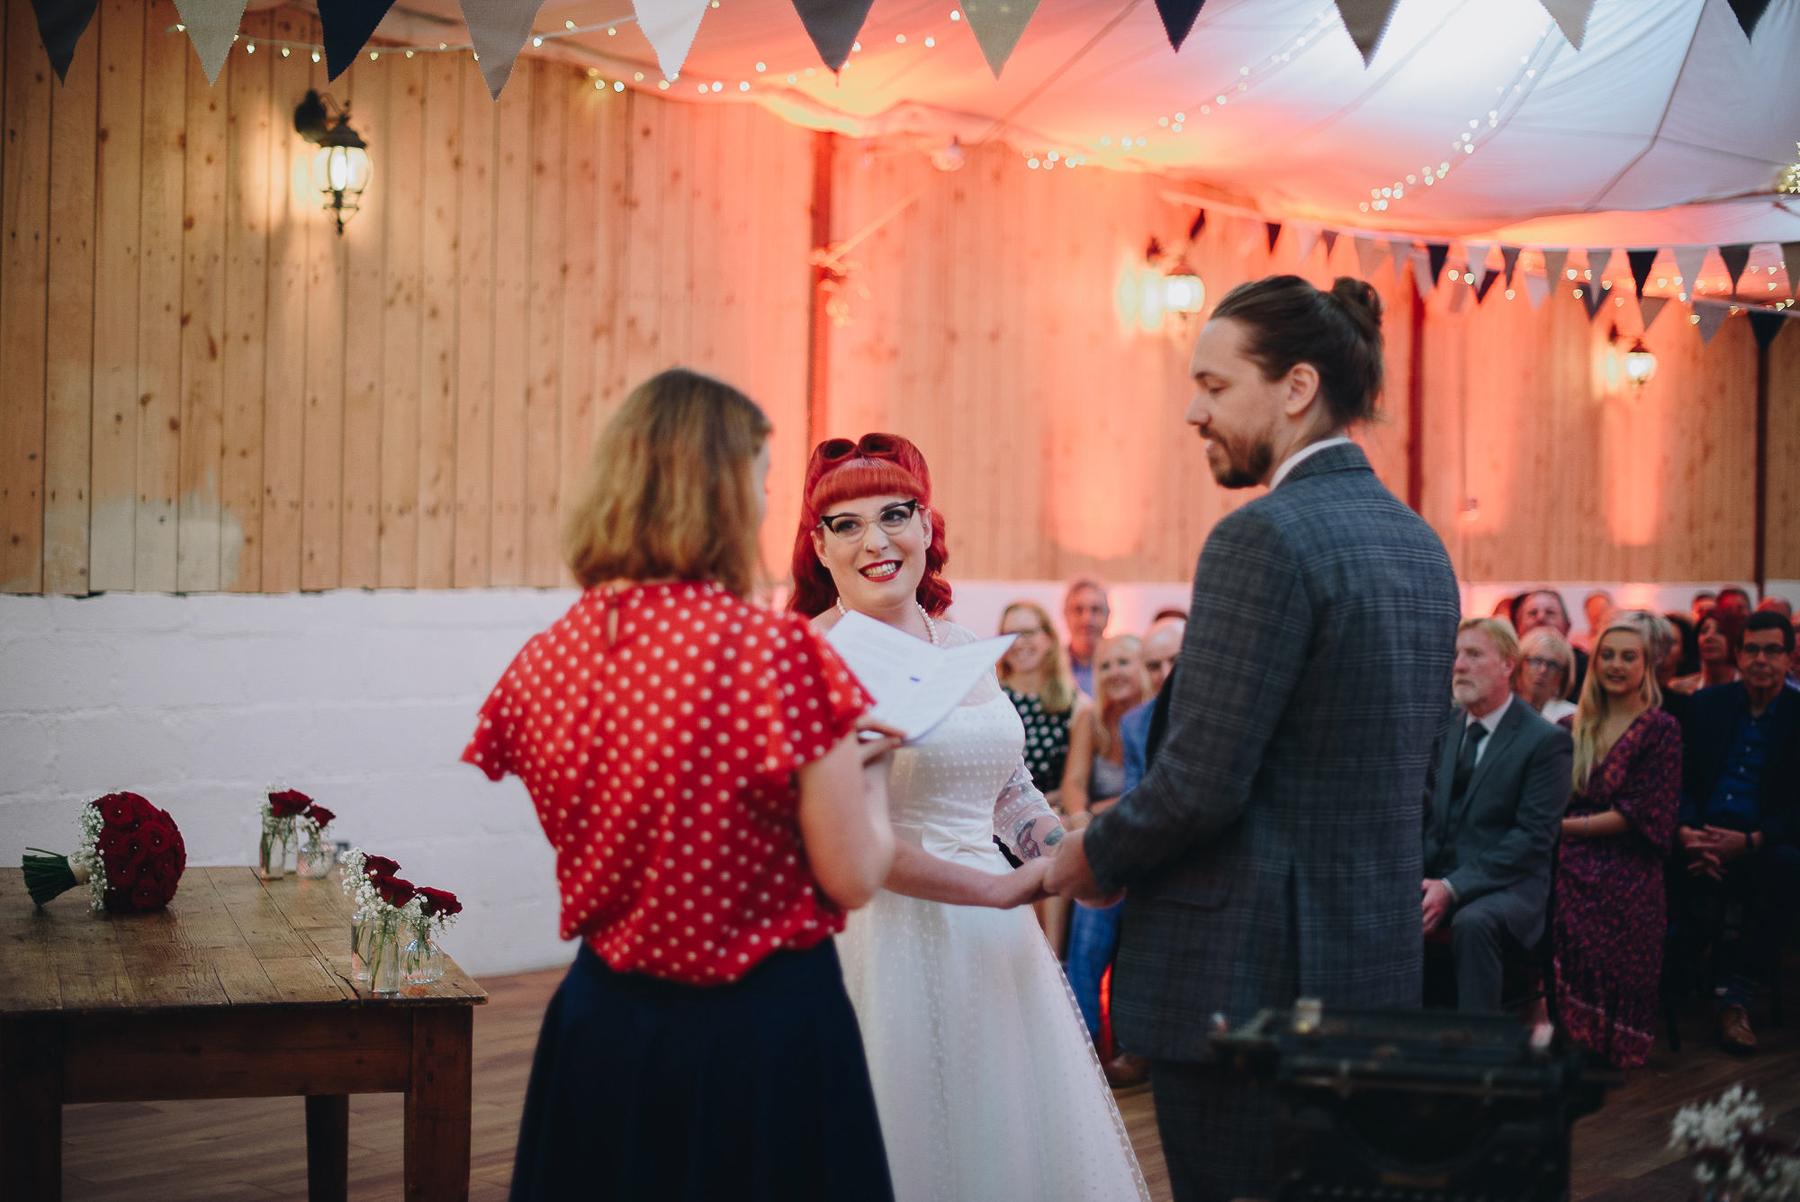 Wellbeing_Farm_Wedding_Photography_The_Pin-Up_Bride_Lara_Shaun-62.jpg